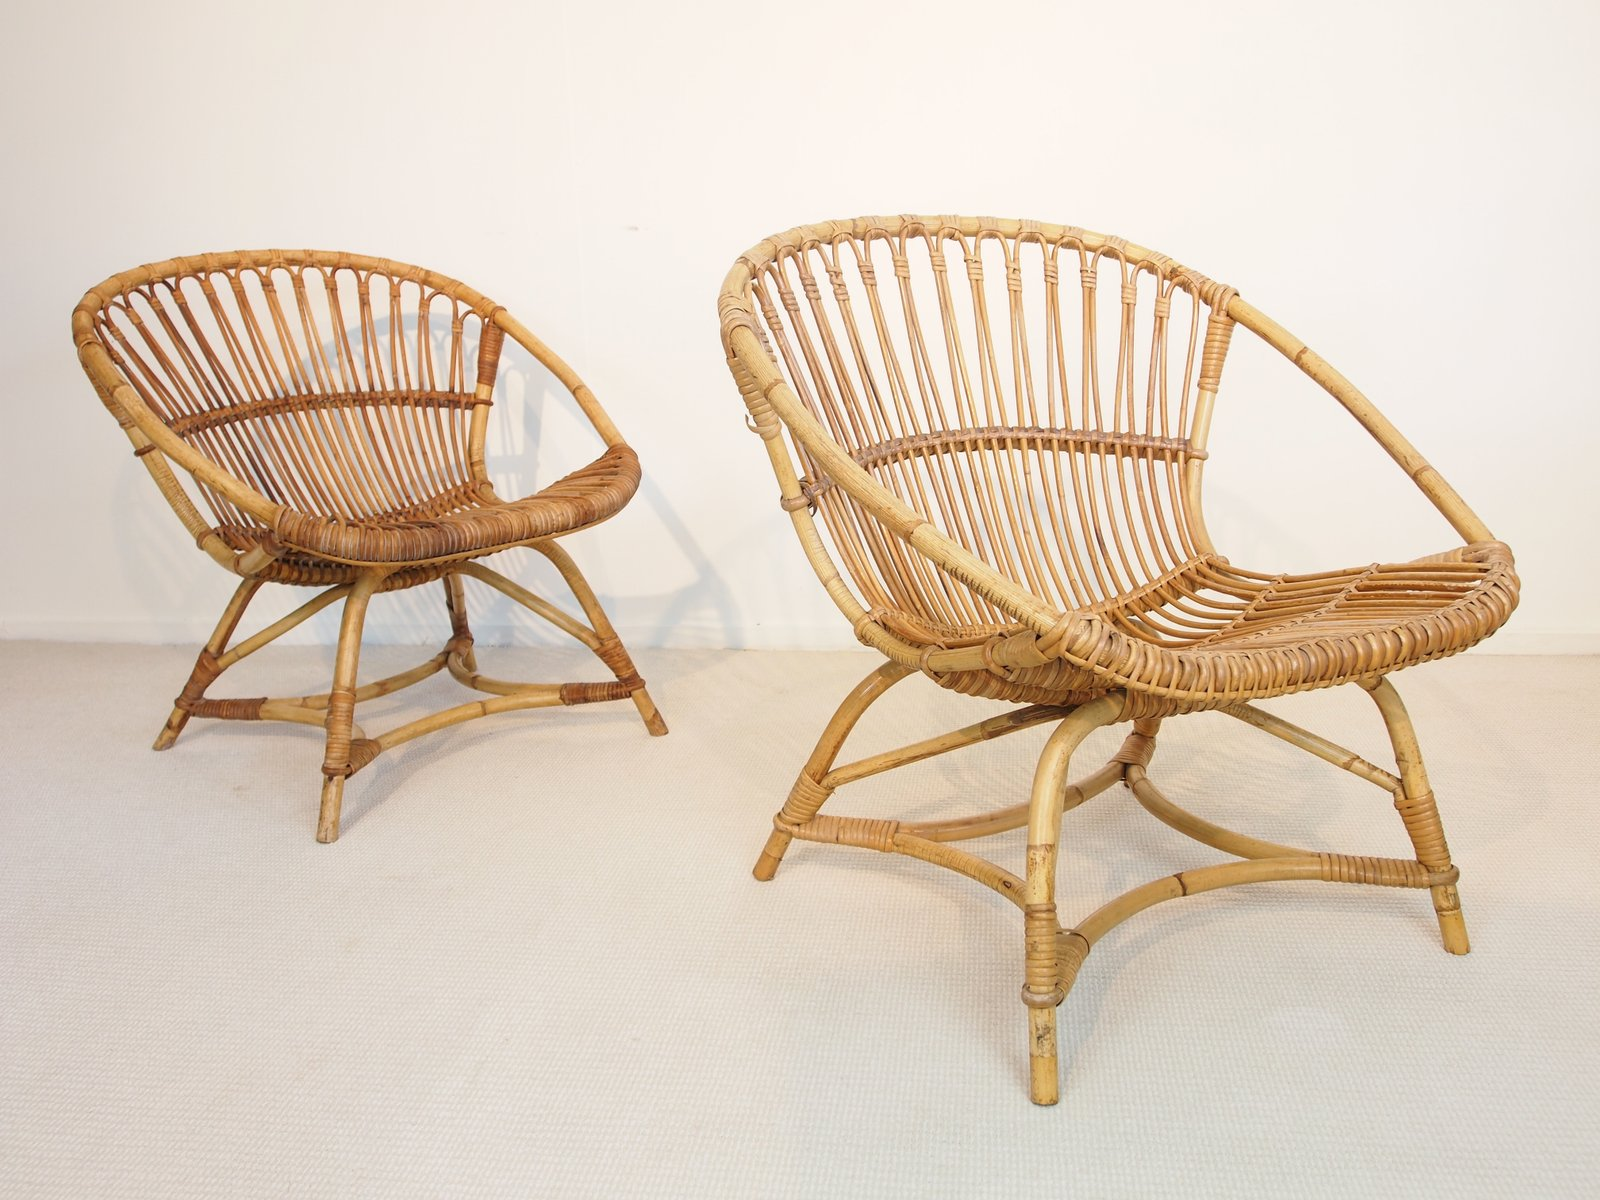 fauteuil mid century en rotin par dirk van sliedregt pour gebroeders jonker pays bas 1949 set. Black Bedroom Furniture Sets. Home Design Ideas